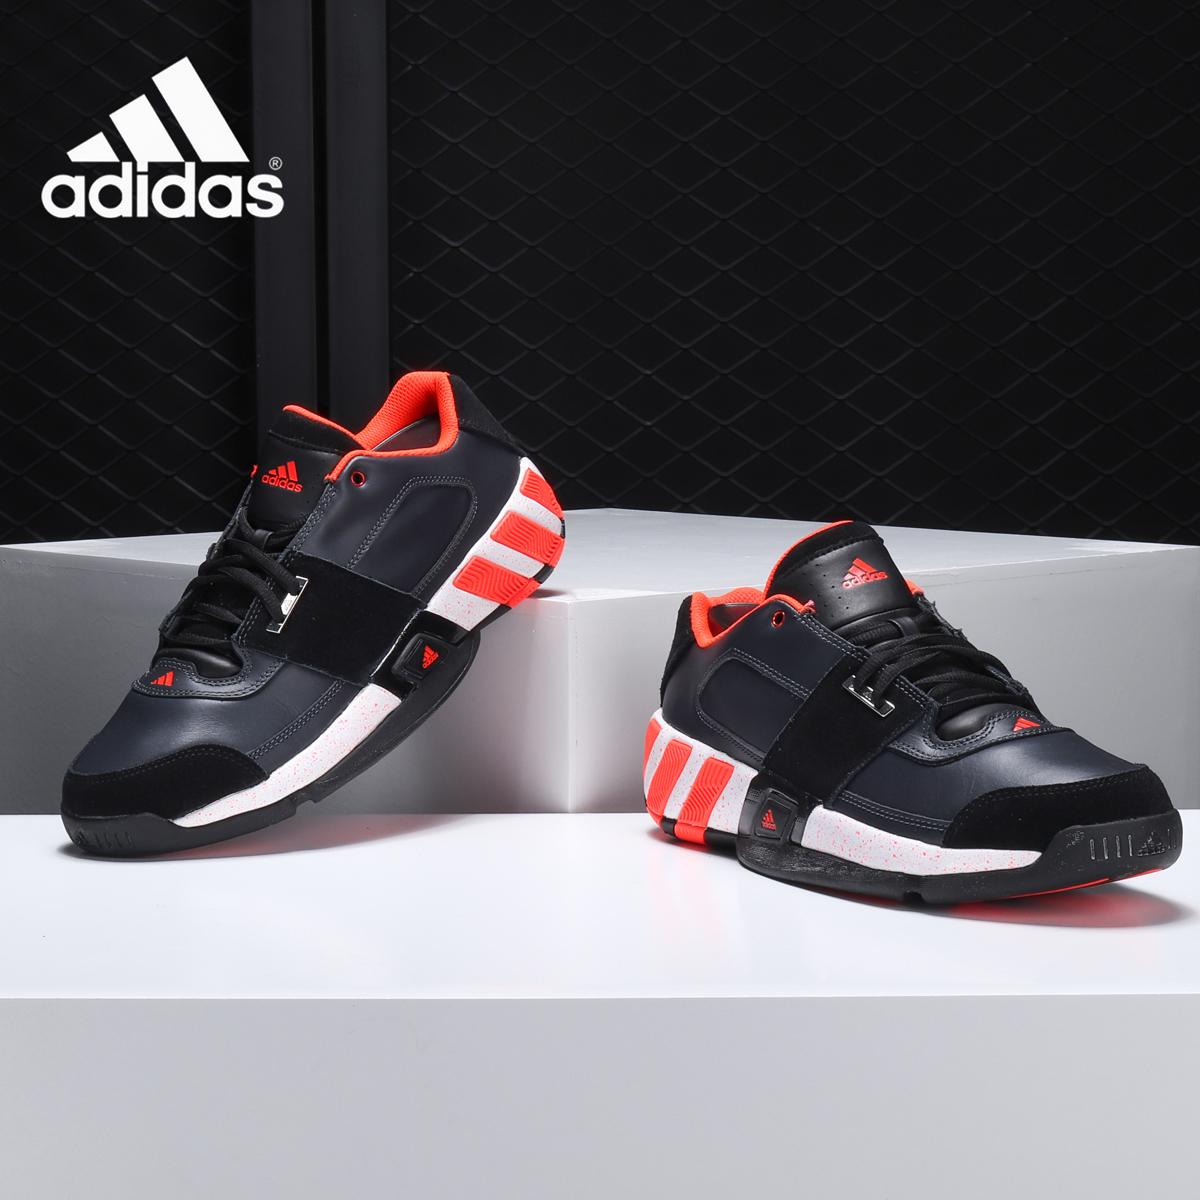 Adidas/阿迪达斯正品 REGULATE阿里纳斯 休闲运动男篮球鞋S83778